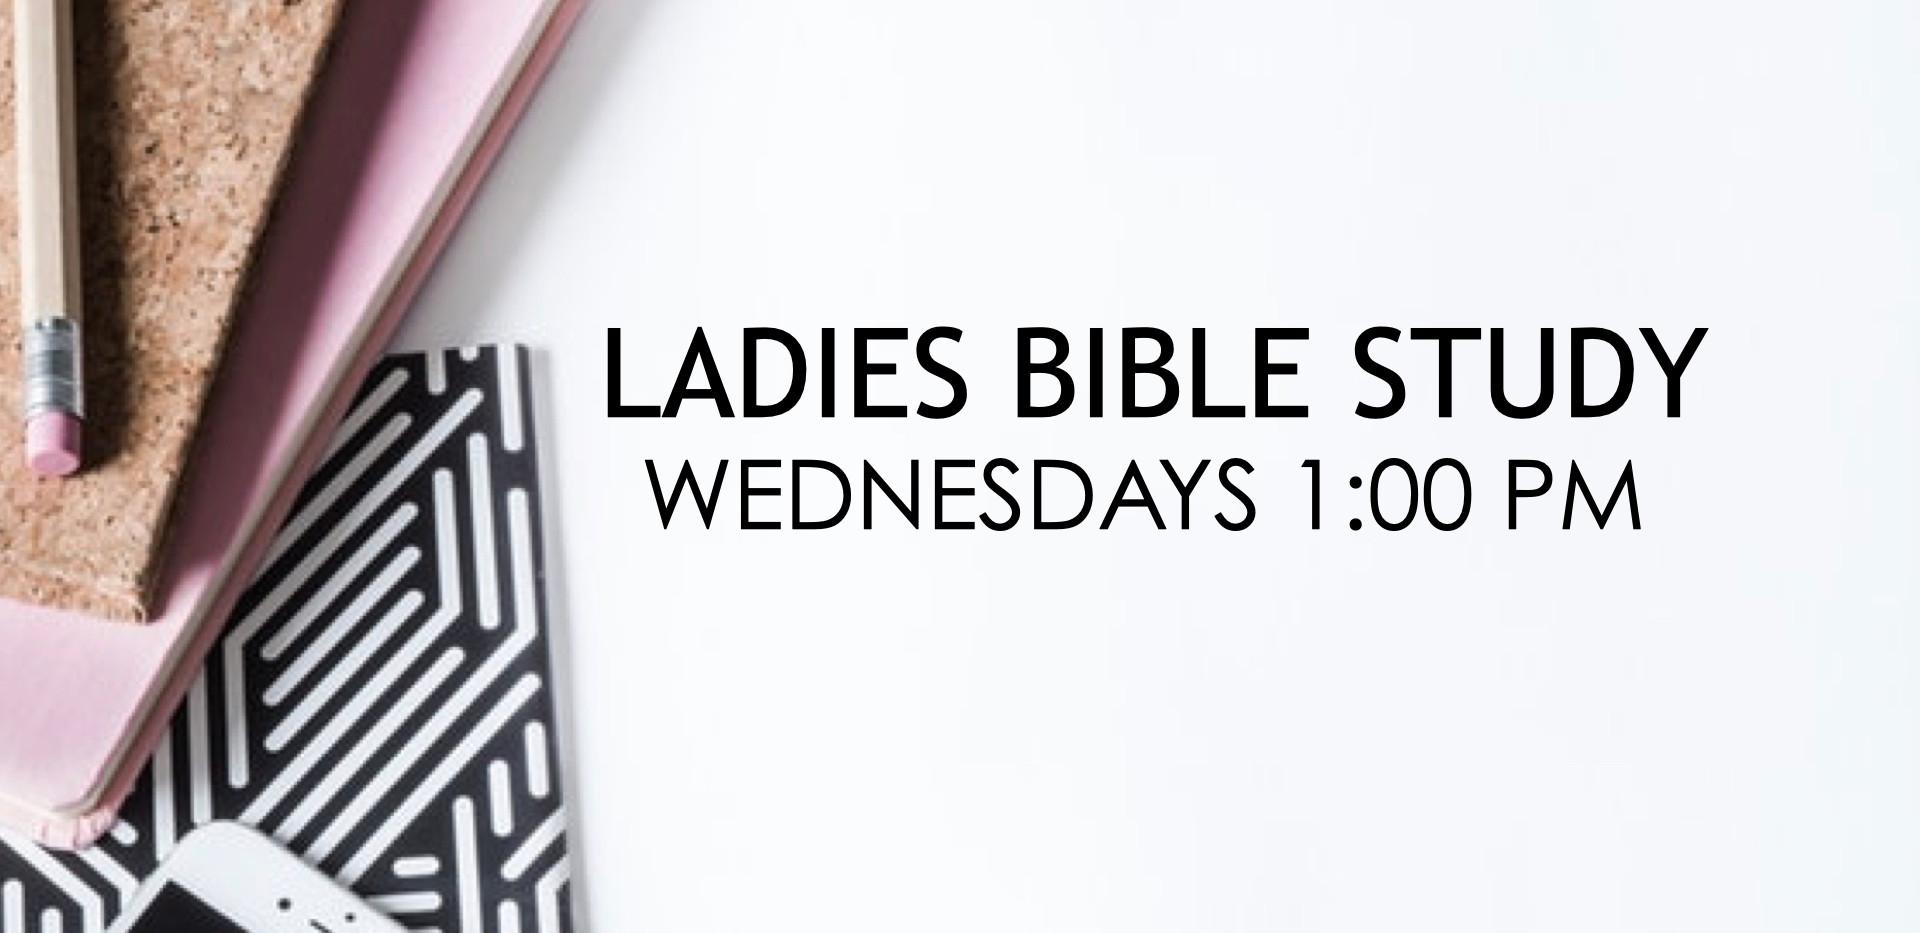 ladies bible study.jpeg